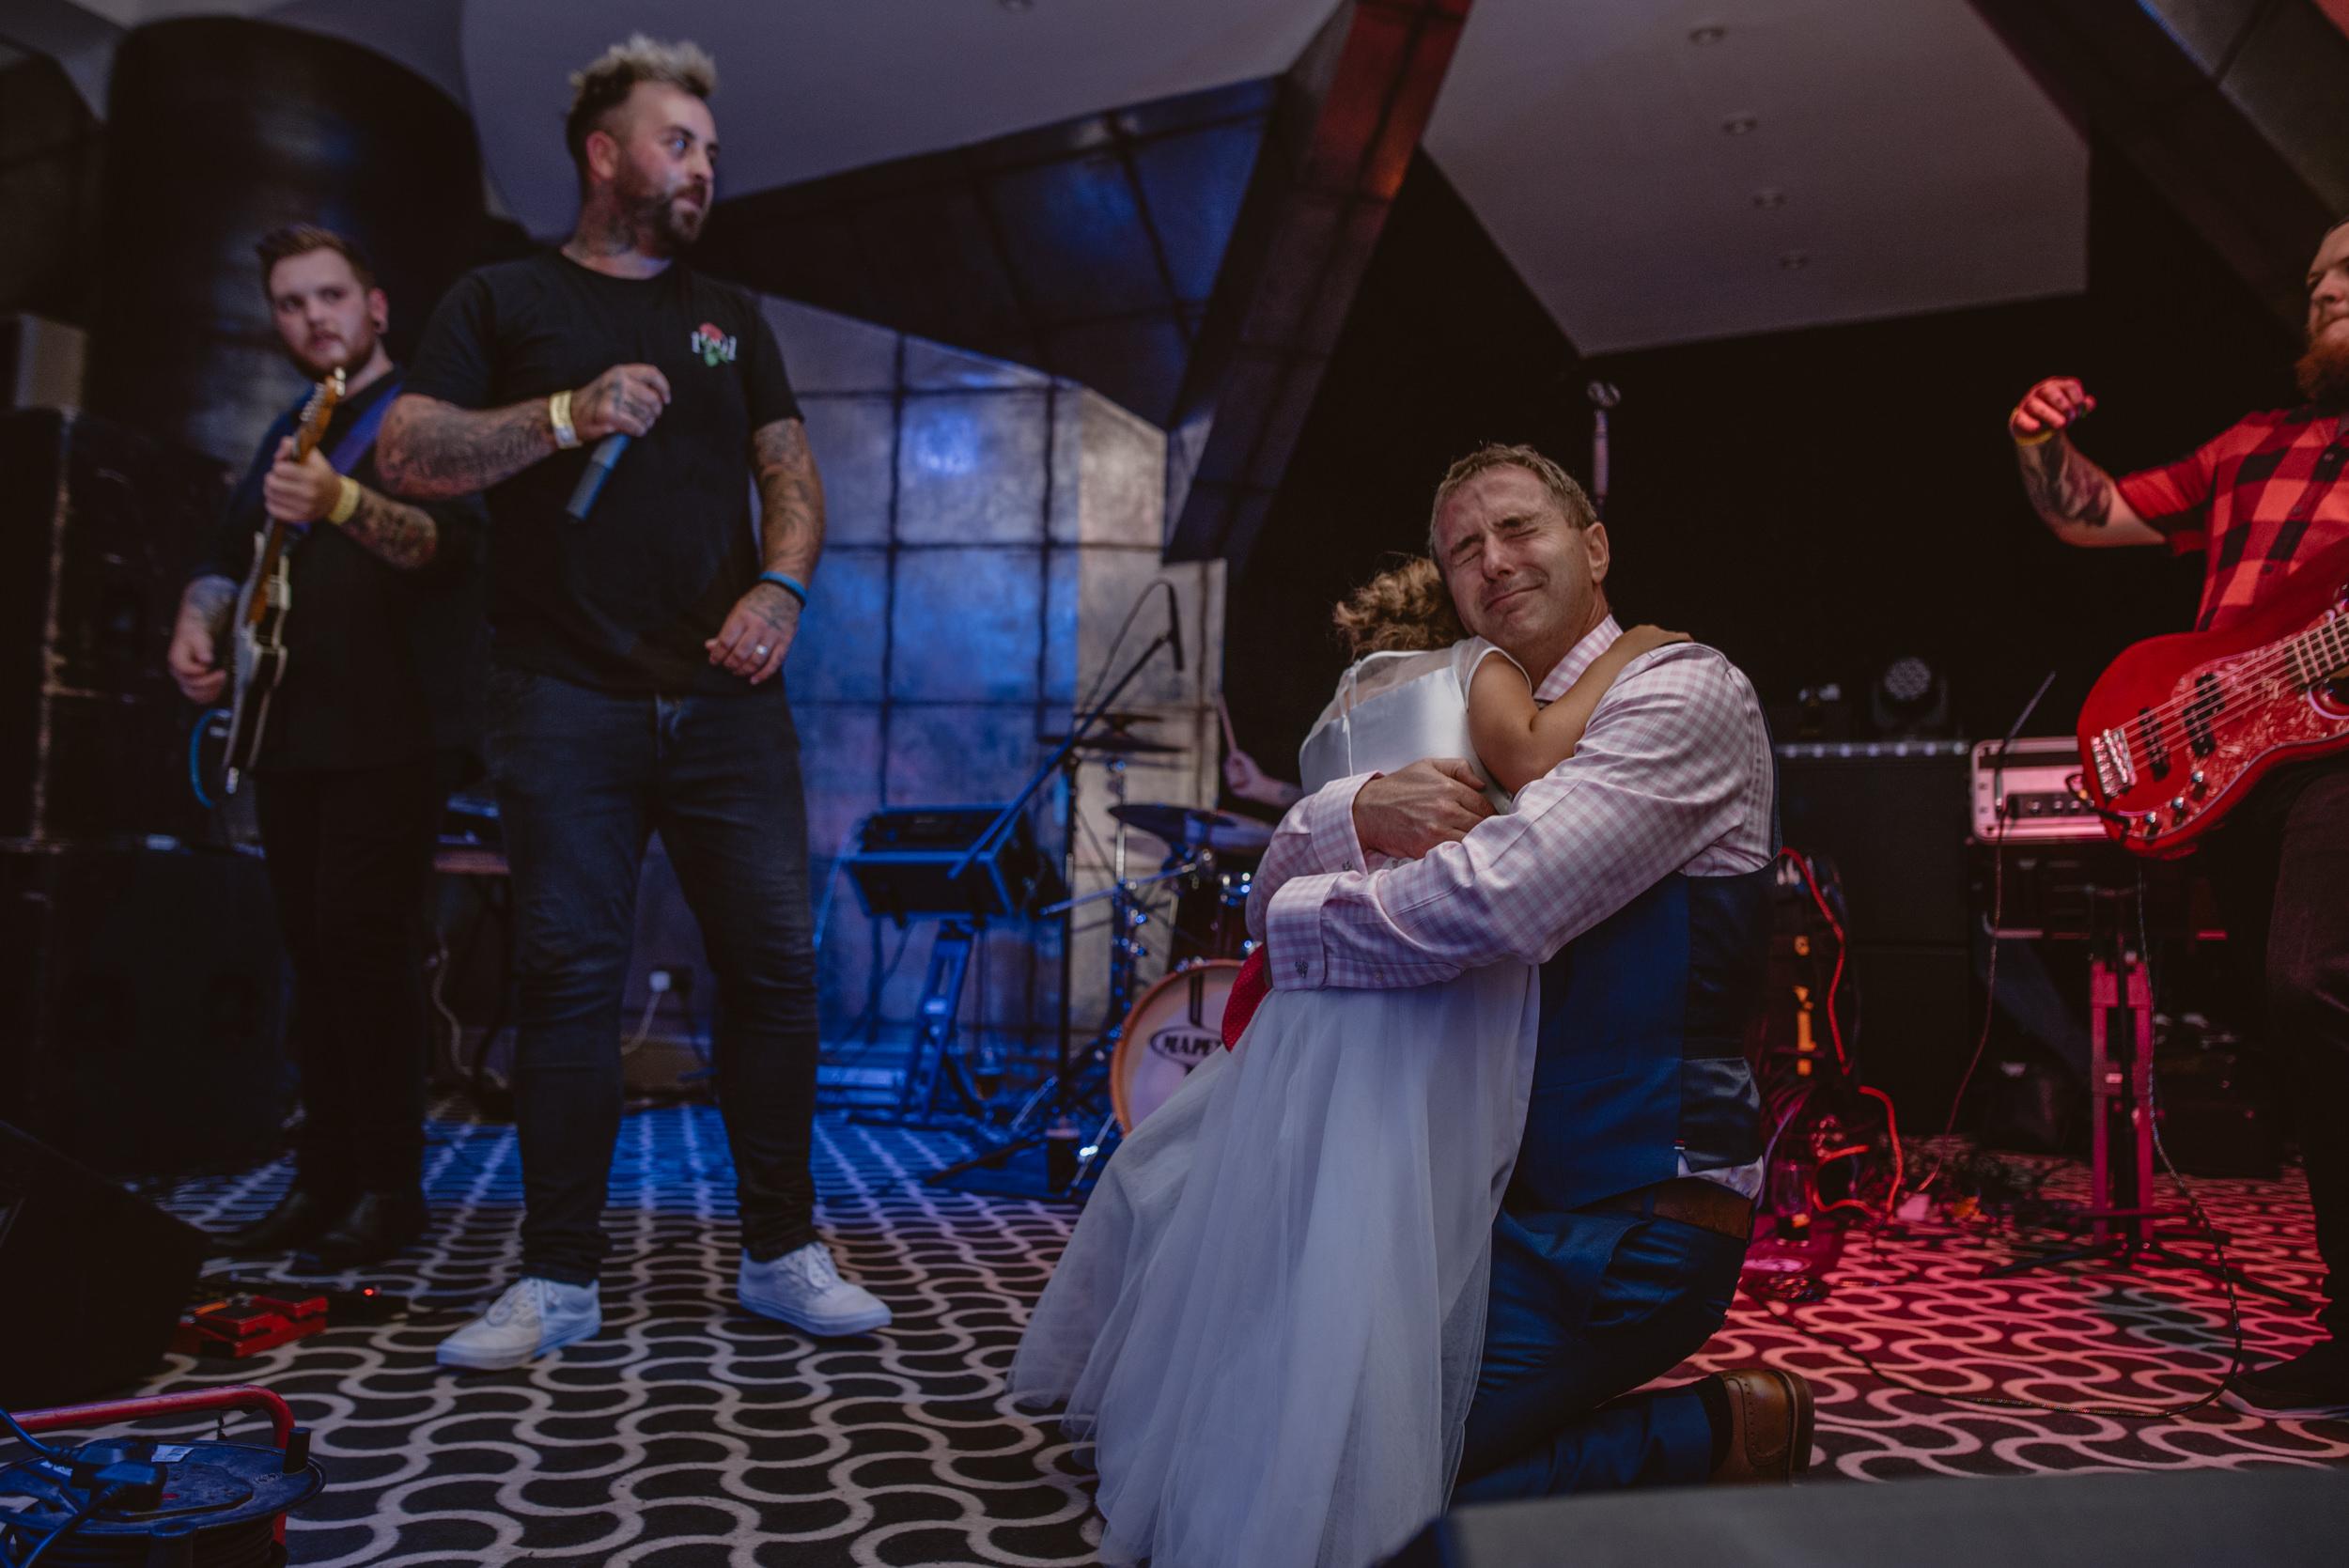 Chantelle-and-Stephen-Old-Thorns-Hotel-Wedding-Liphook-Manu-Mendoza-Wedding-Photography-651.jpg